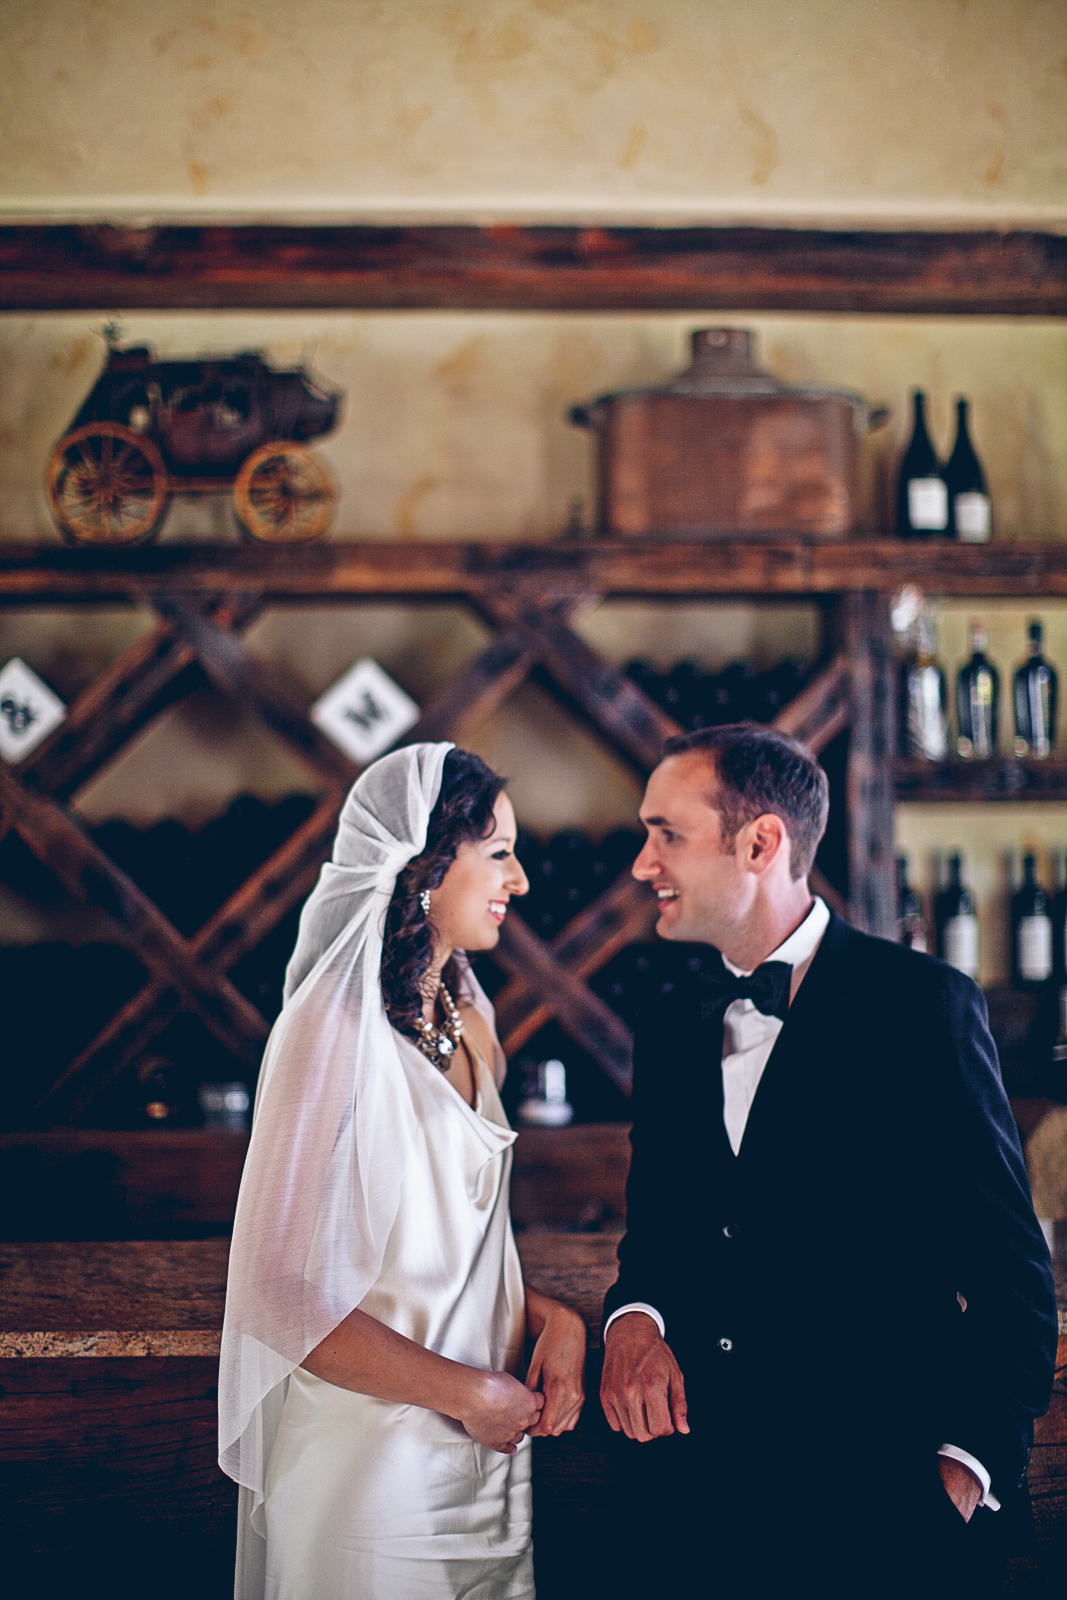 miraflores_winery_wedding_photography_ian_melissa_ebony_siovhan_bokeh_photography_14.jpg